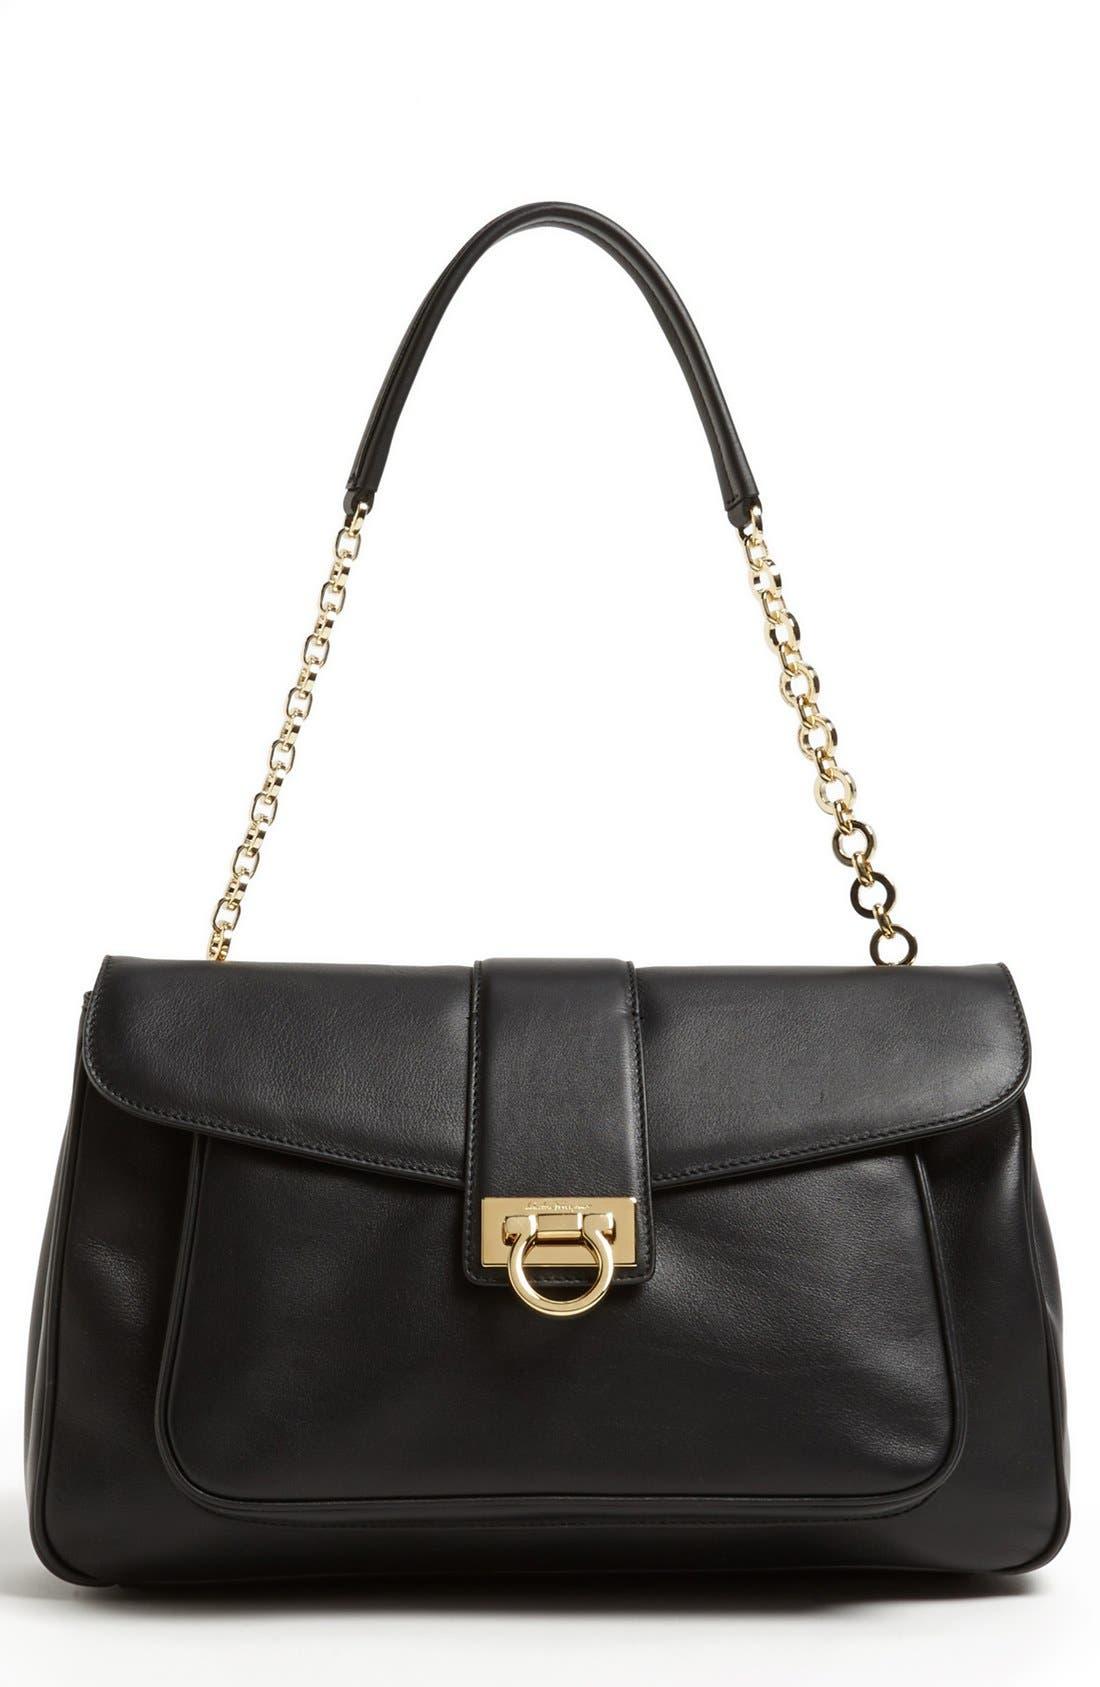 Main Image - Salvatore Ferragamo 'Paula' Leather Shoulder Bag